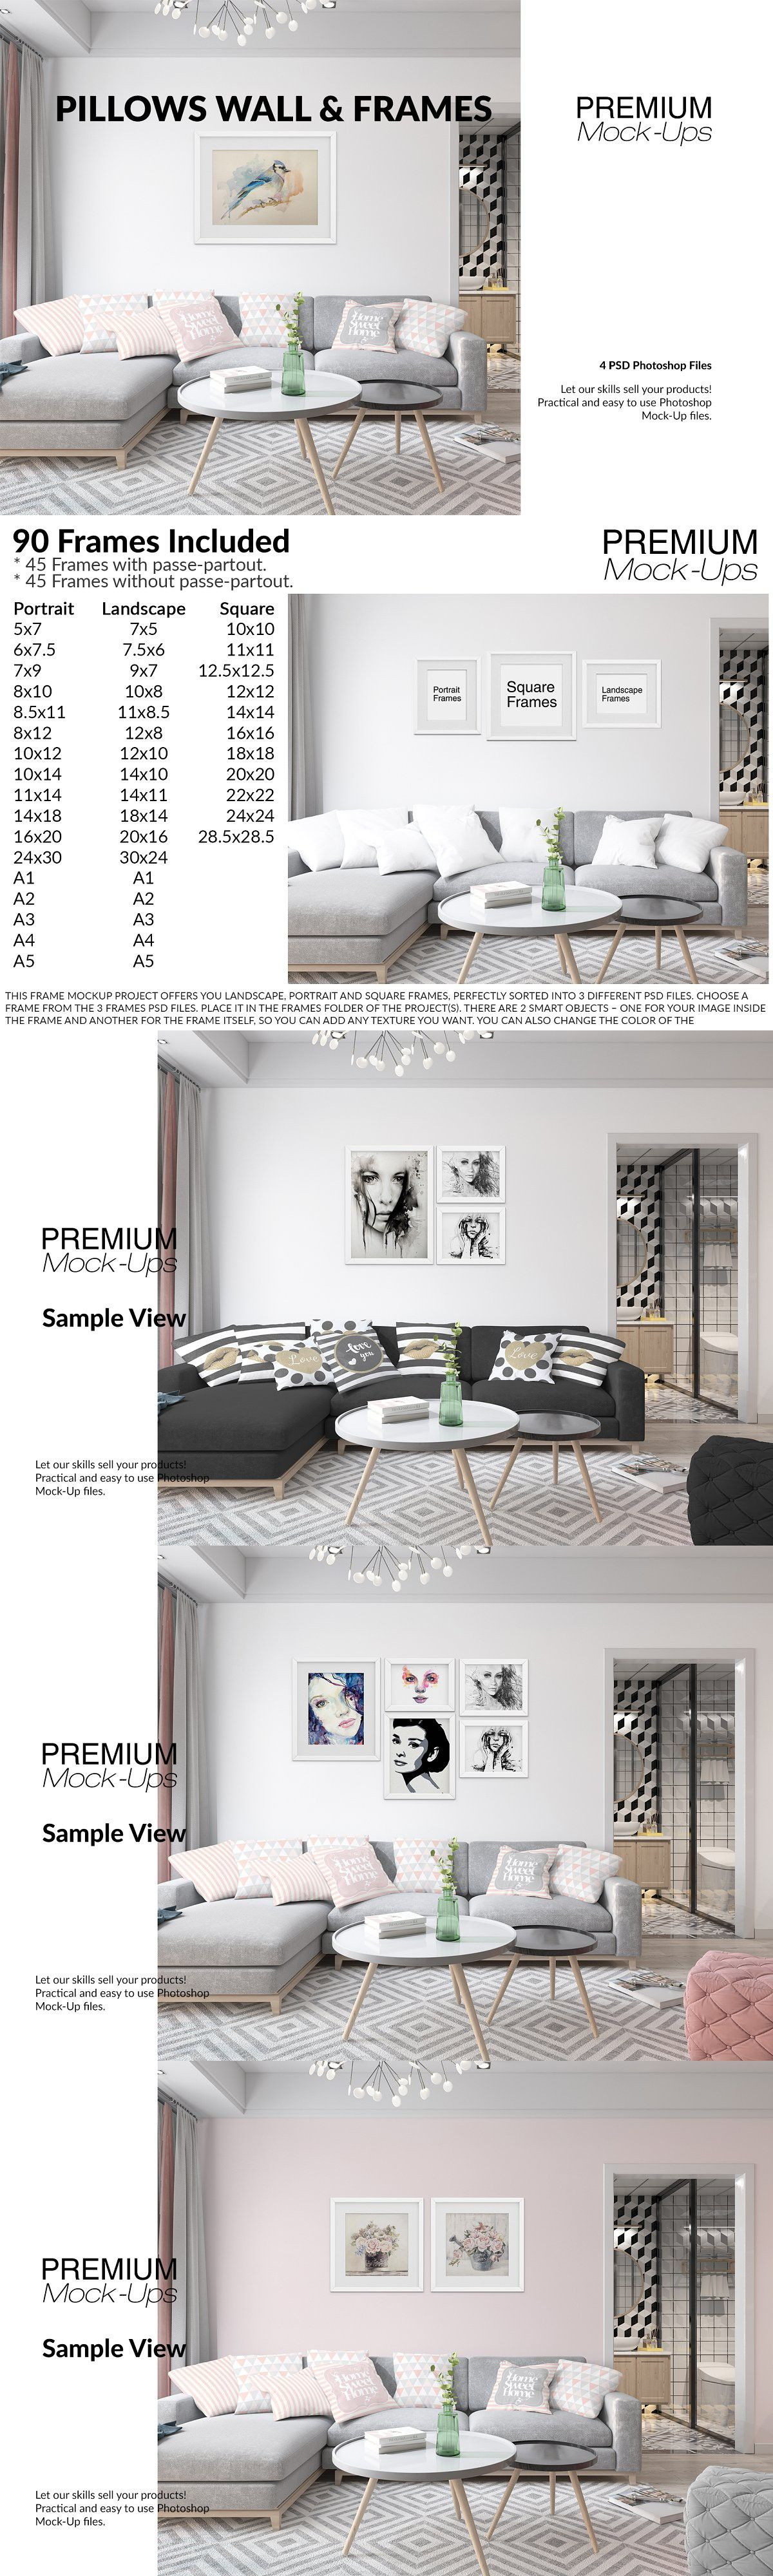 Pillows Frames In Living Room Web Design Resources Living Room Sets Room